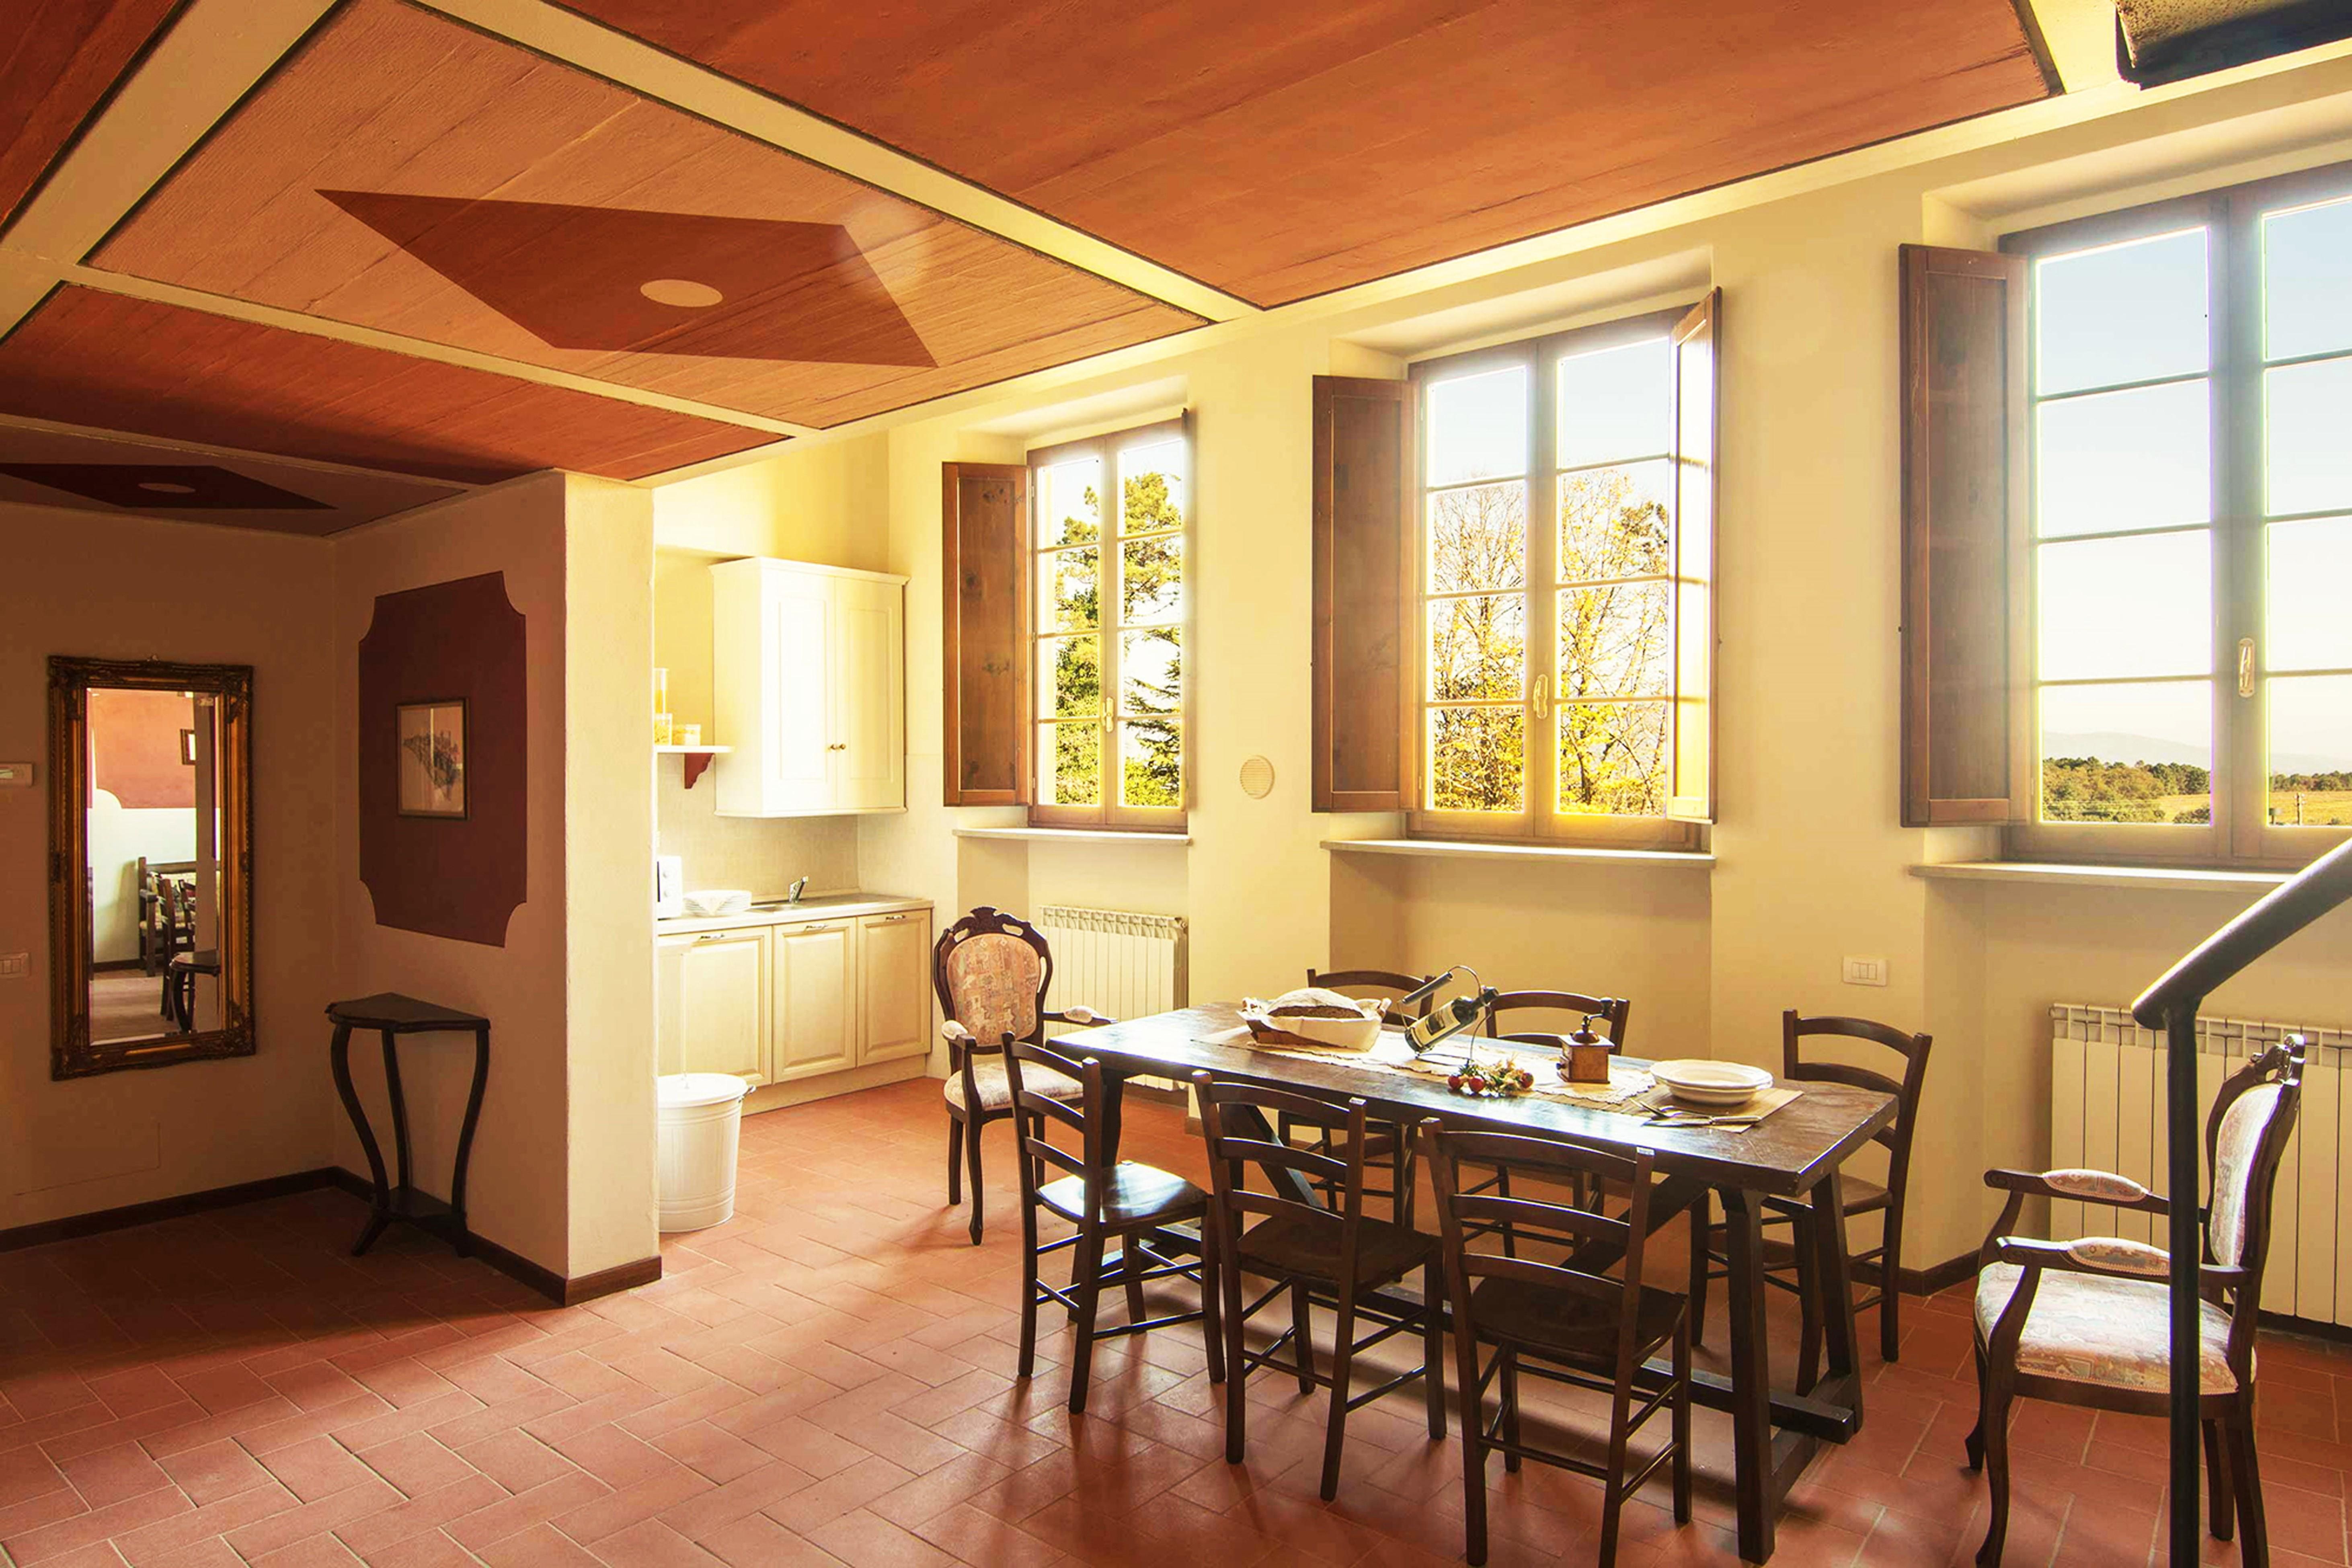 Appartamento con cucina completa